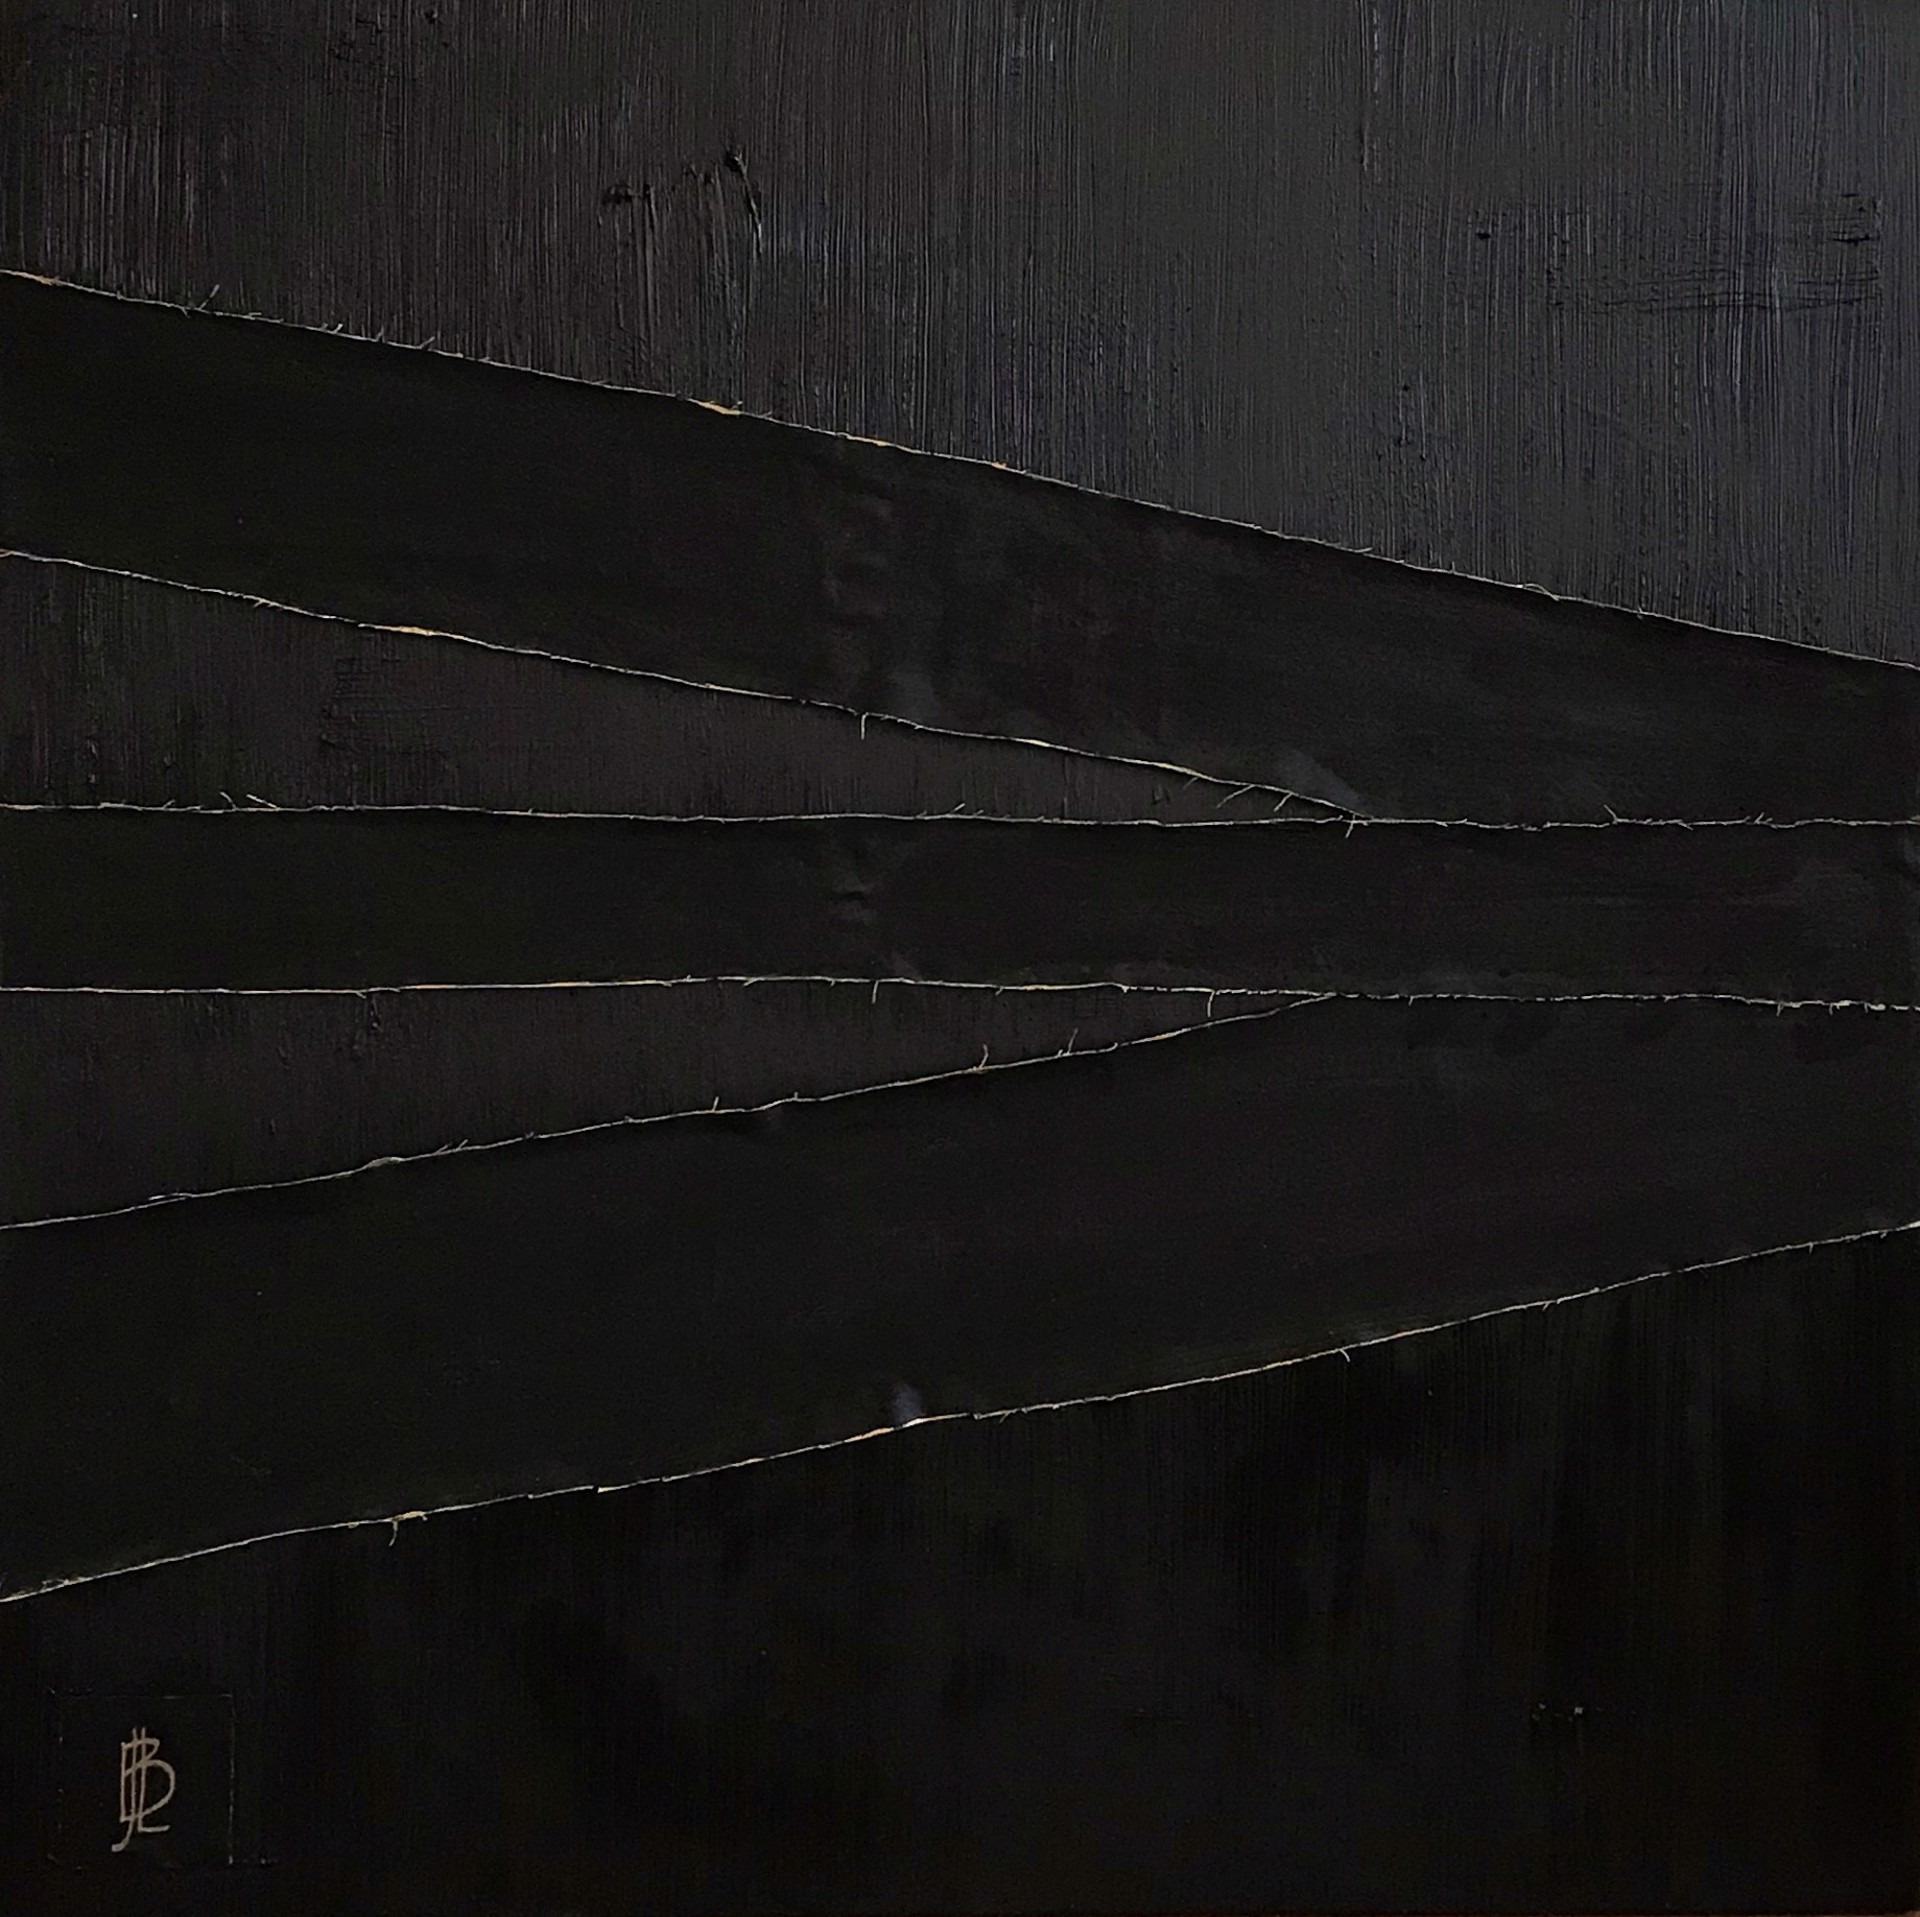 Noir by Leslie Poteet Busker